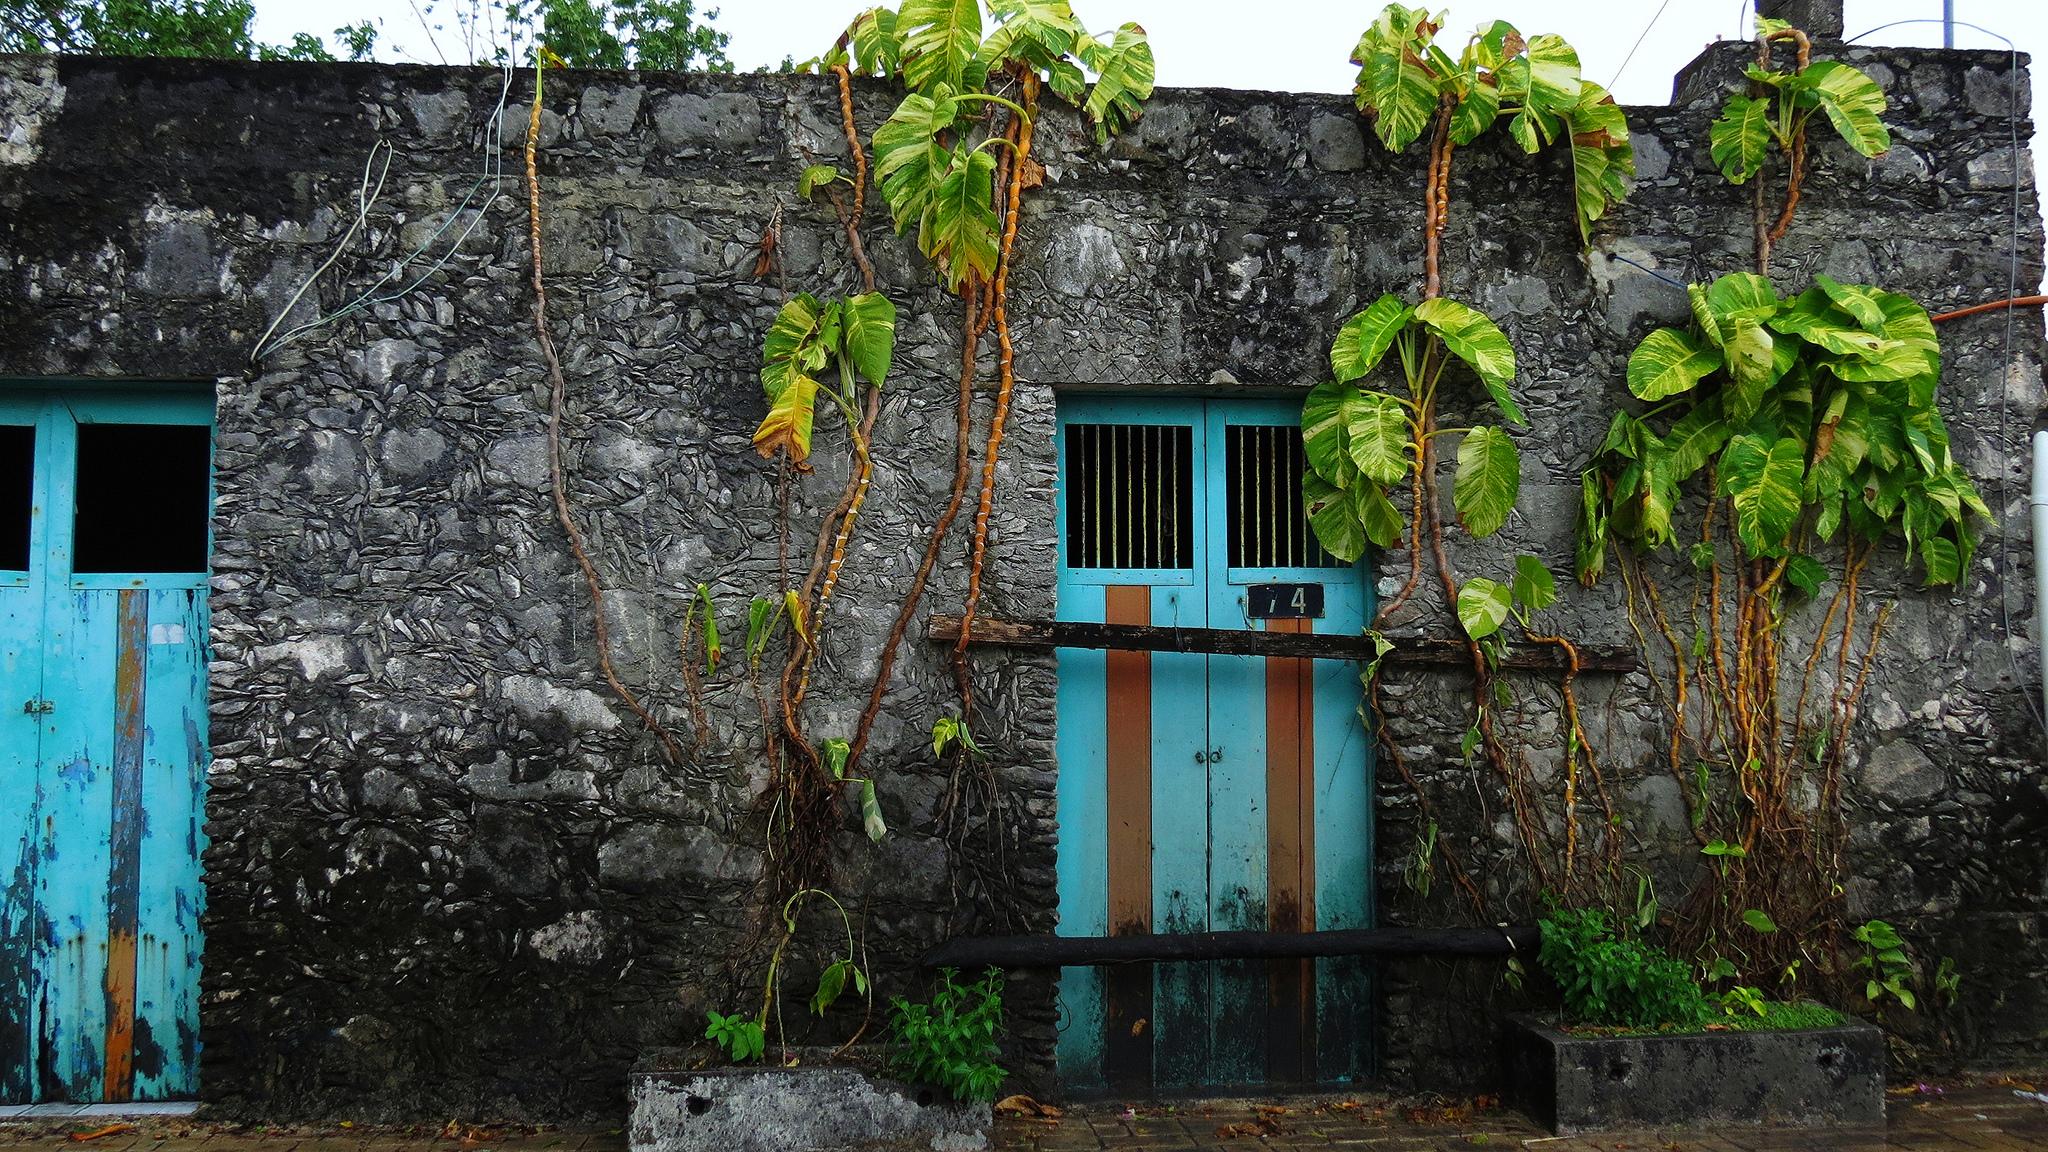 Tranquil Cozumel © Lara Danielle/Flickr